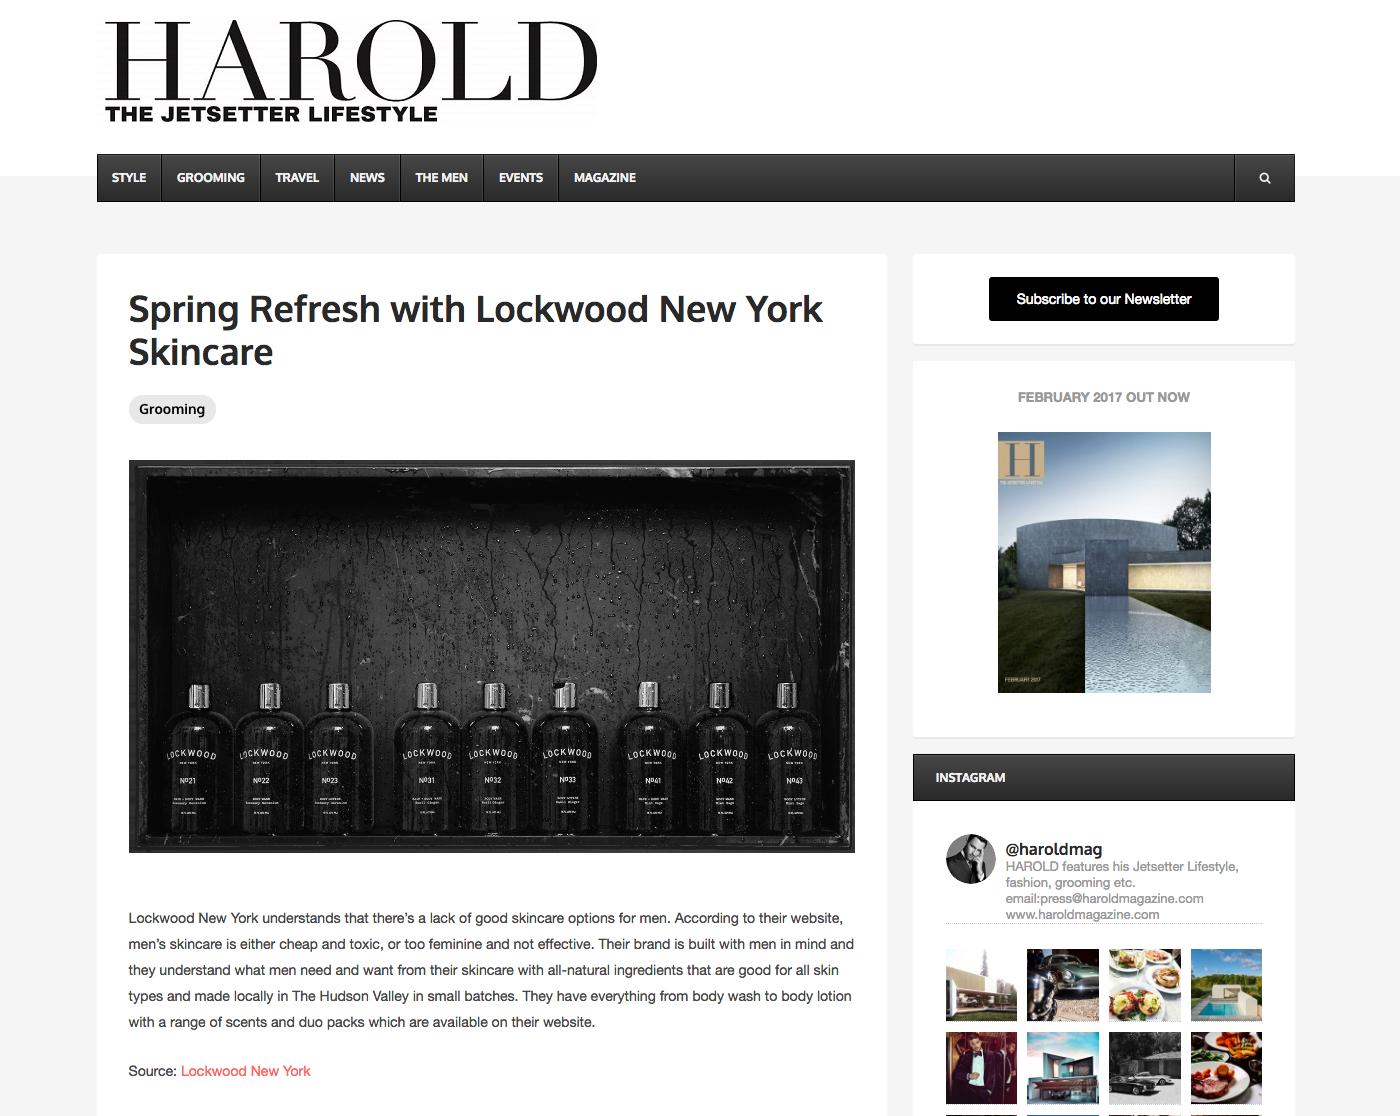 Harold Magazine: Spring Refresh With Lockwood New York